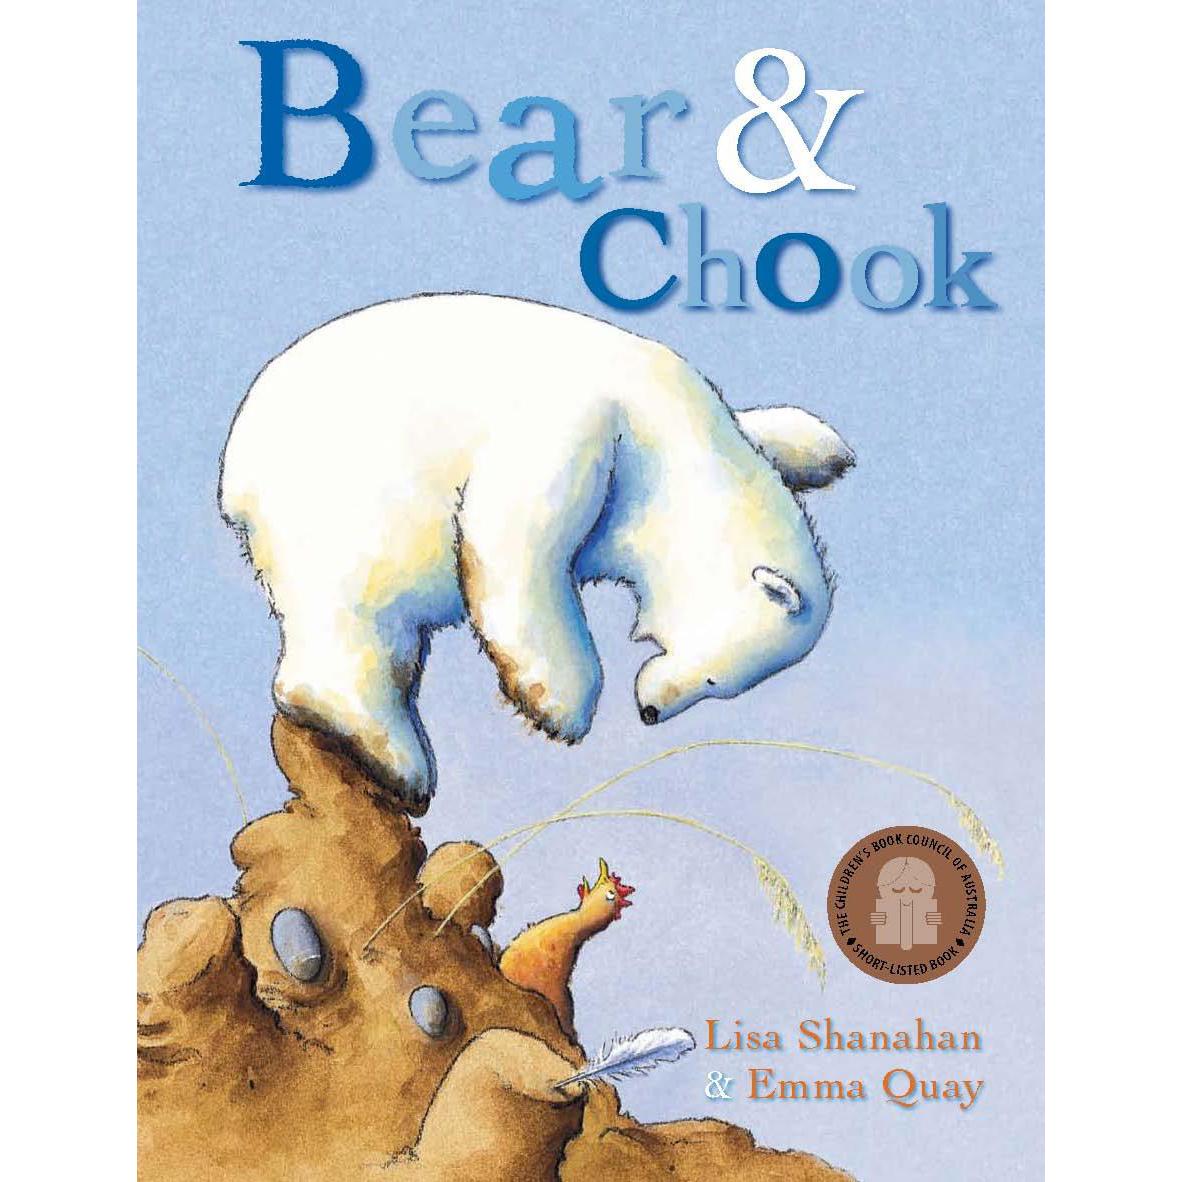 BEAR AND CHOOK by Lisa Shanahan & Emma Quay (Lothian Books)